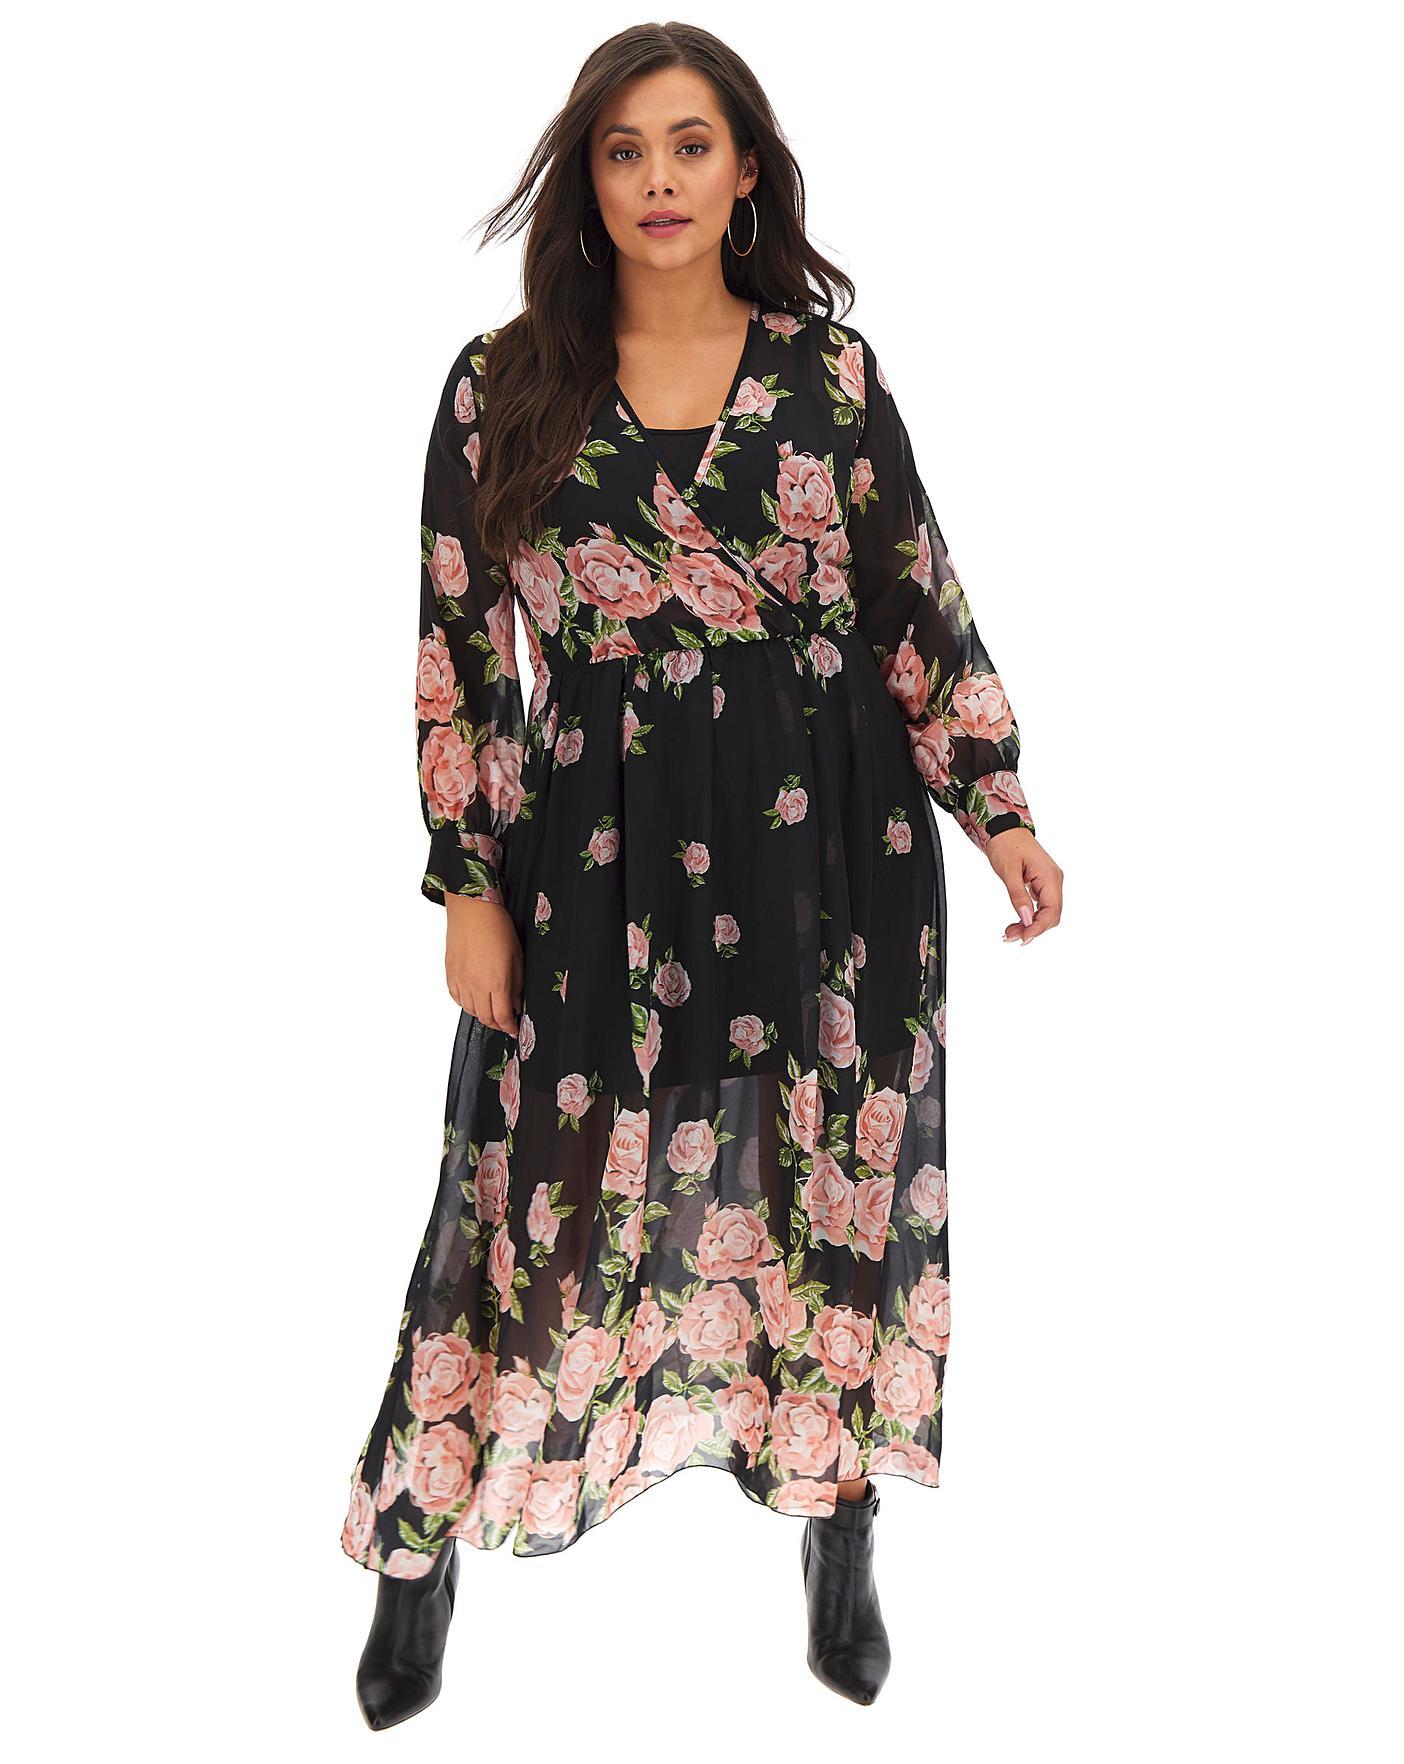 Rose Dress Reviews